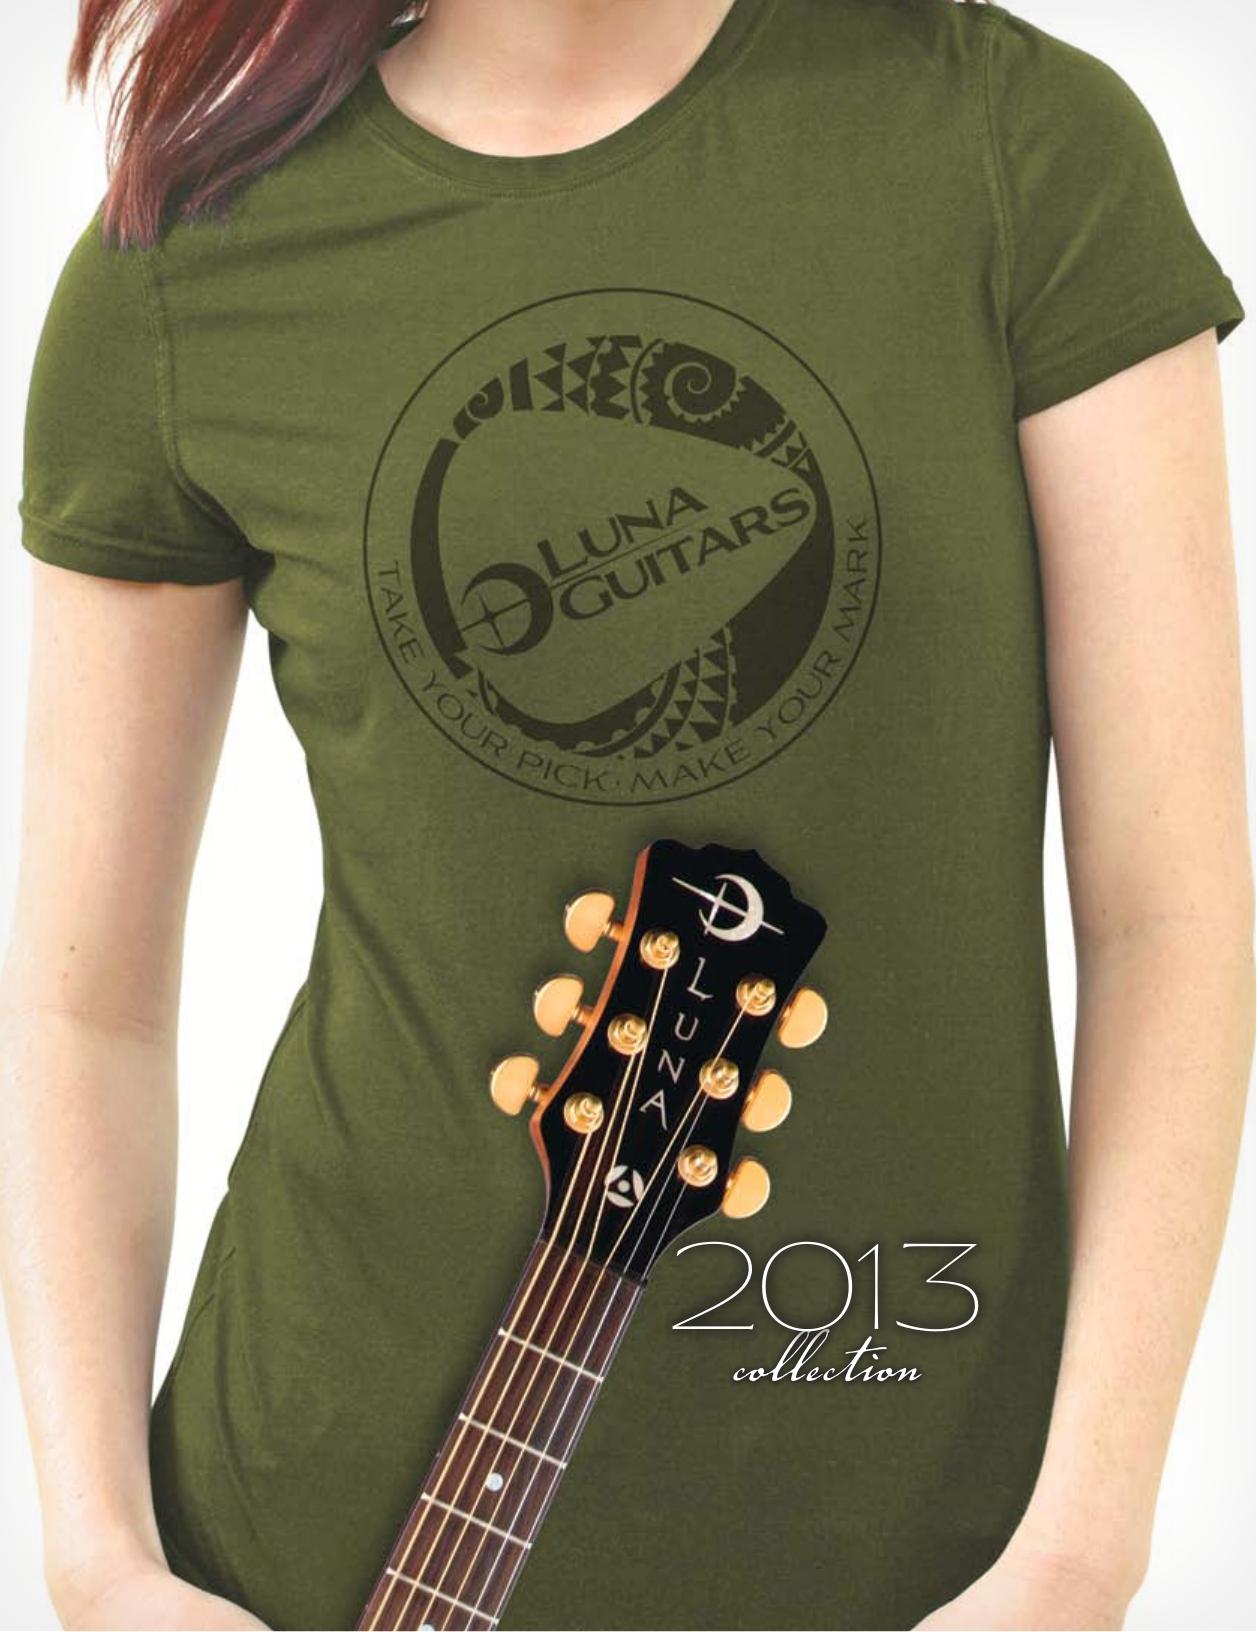 pdf for Luna Guitar Safari Muse Spruce manual